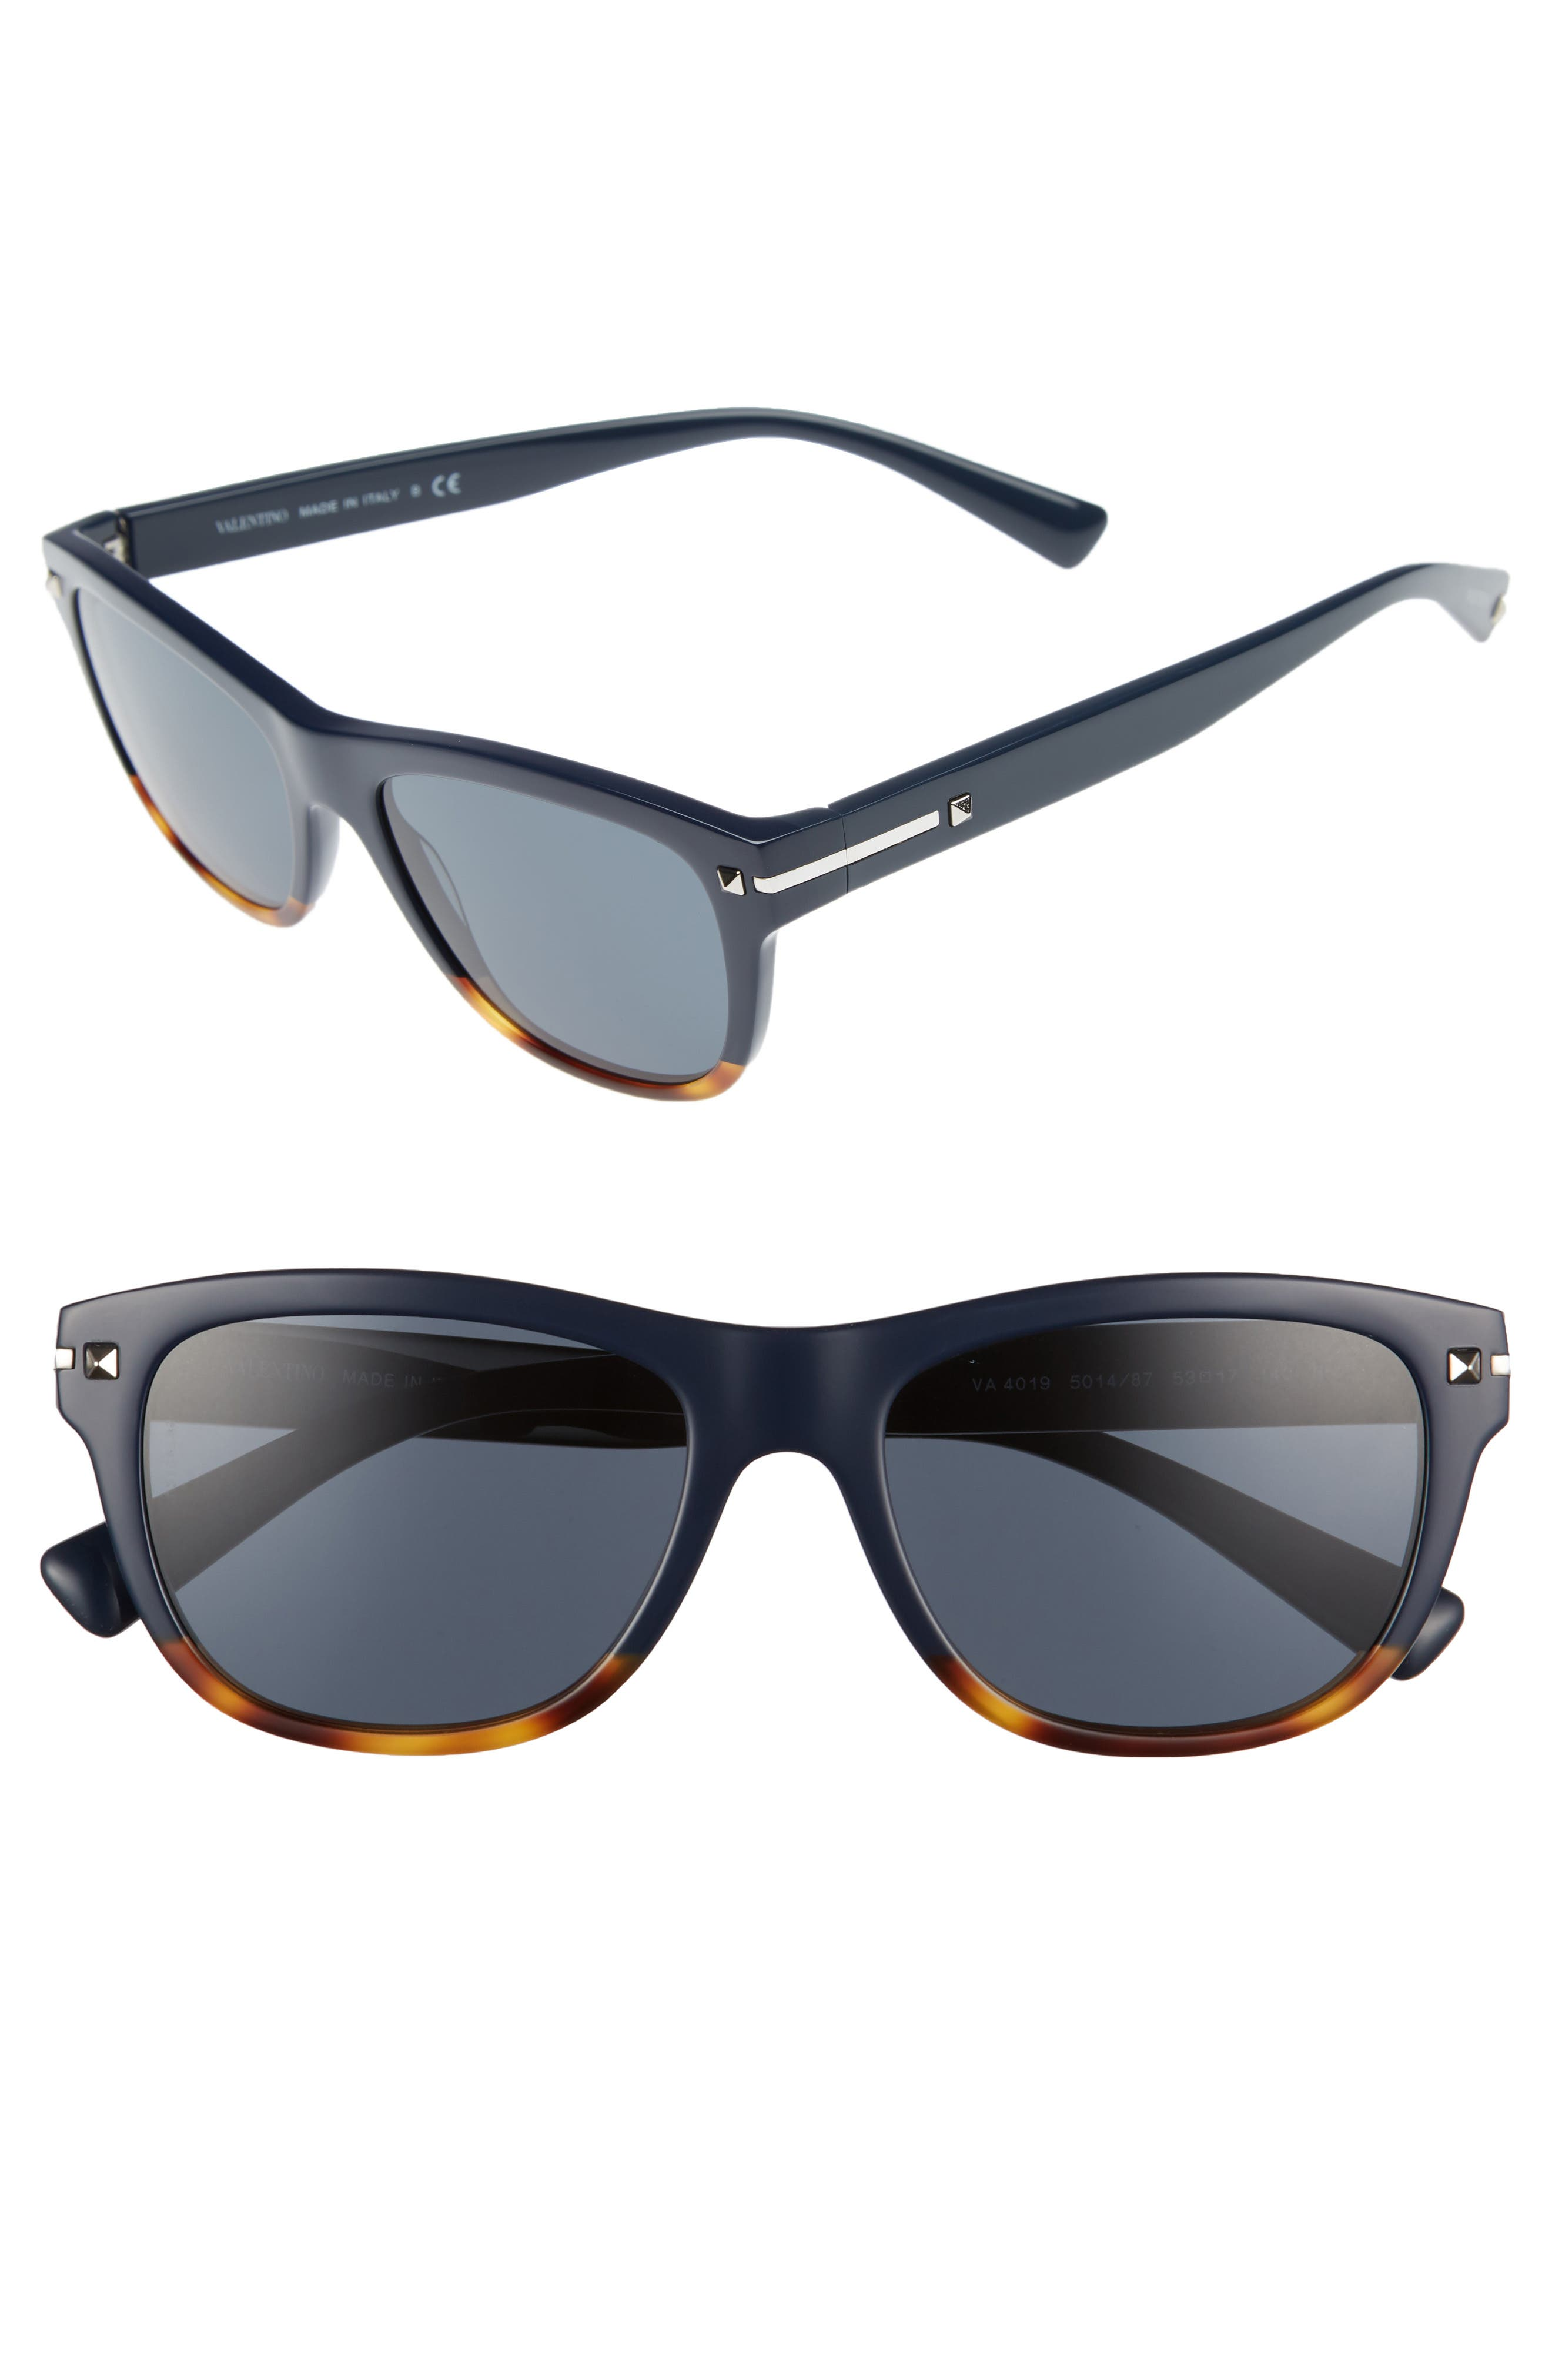 53mm Rectangle Sunglasses,                             Main thumbnail 1, color,                             Blue/ Havana